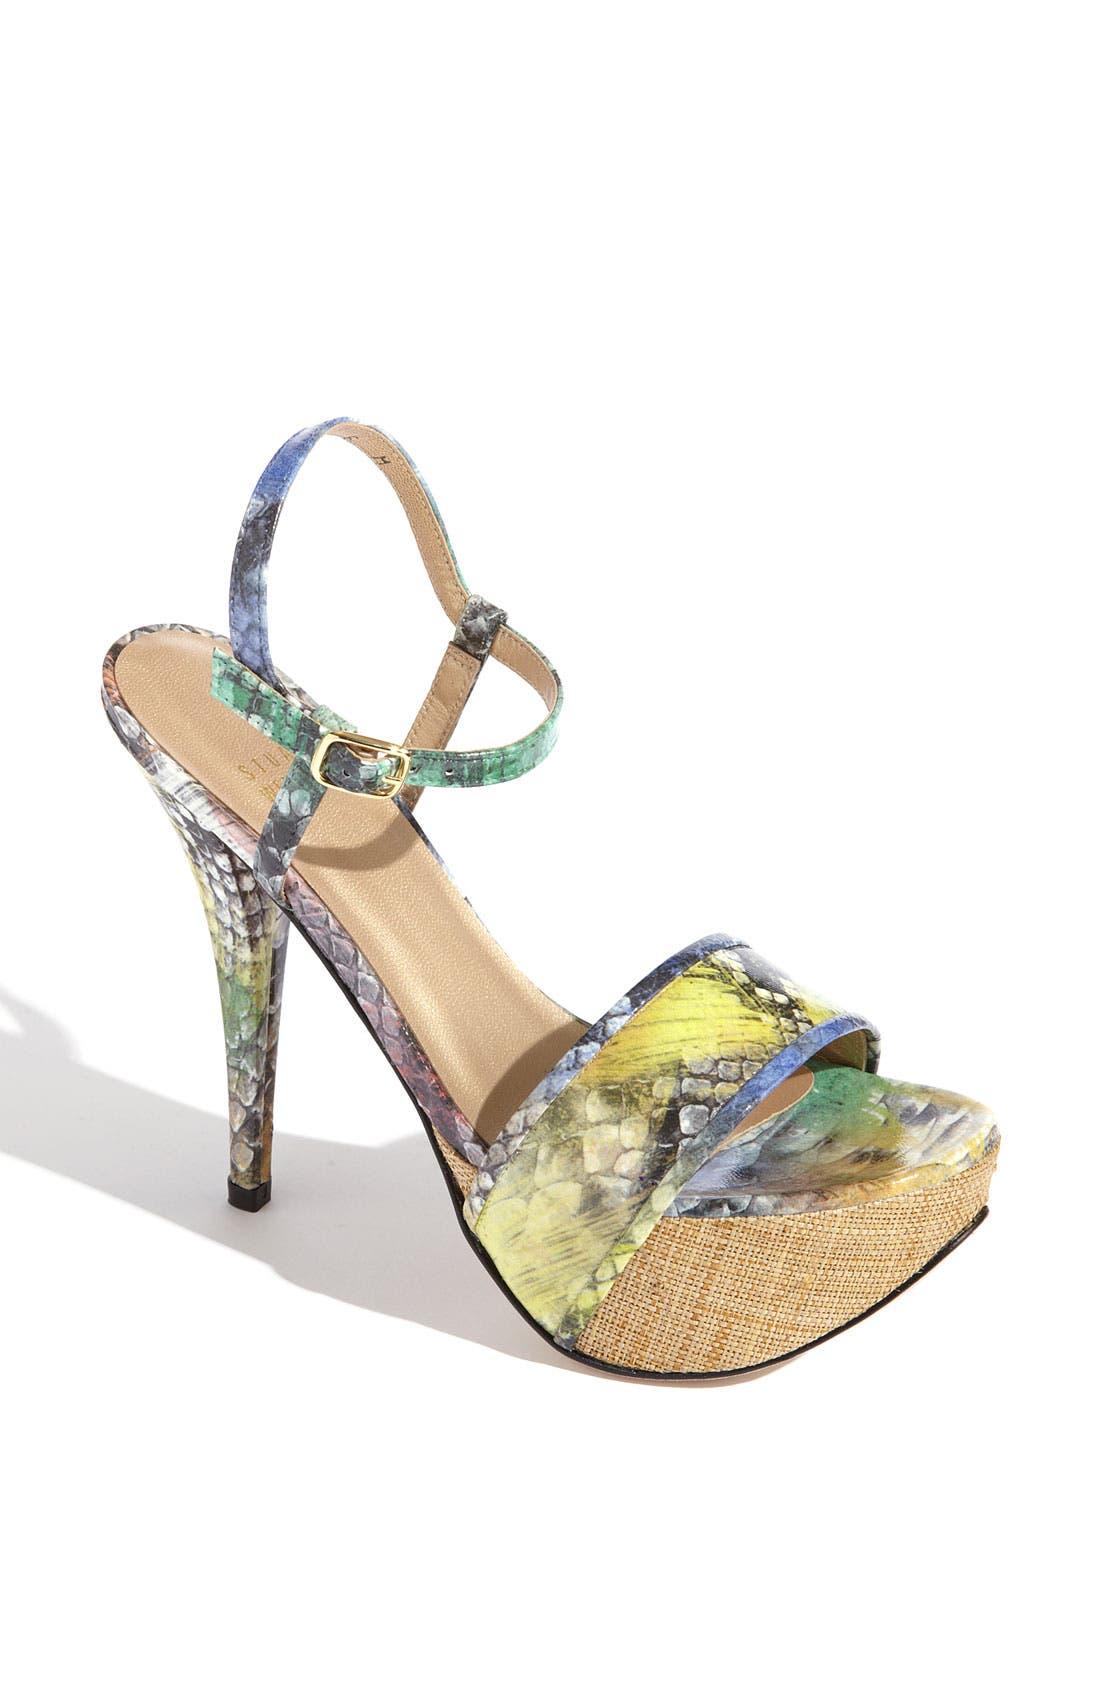 Main Image - Stuart Weitzman 'Onceover' High Heel Sandal